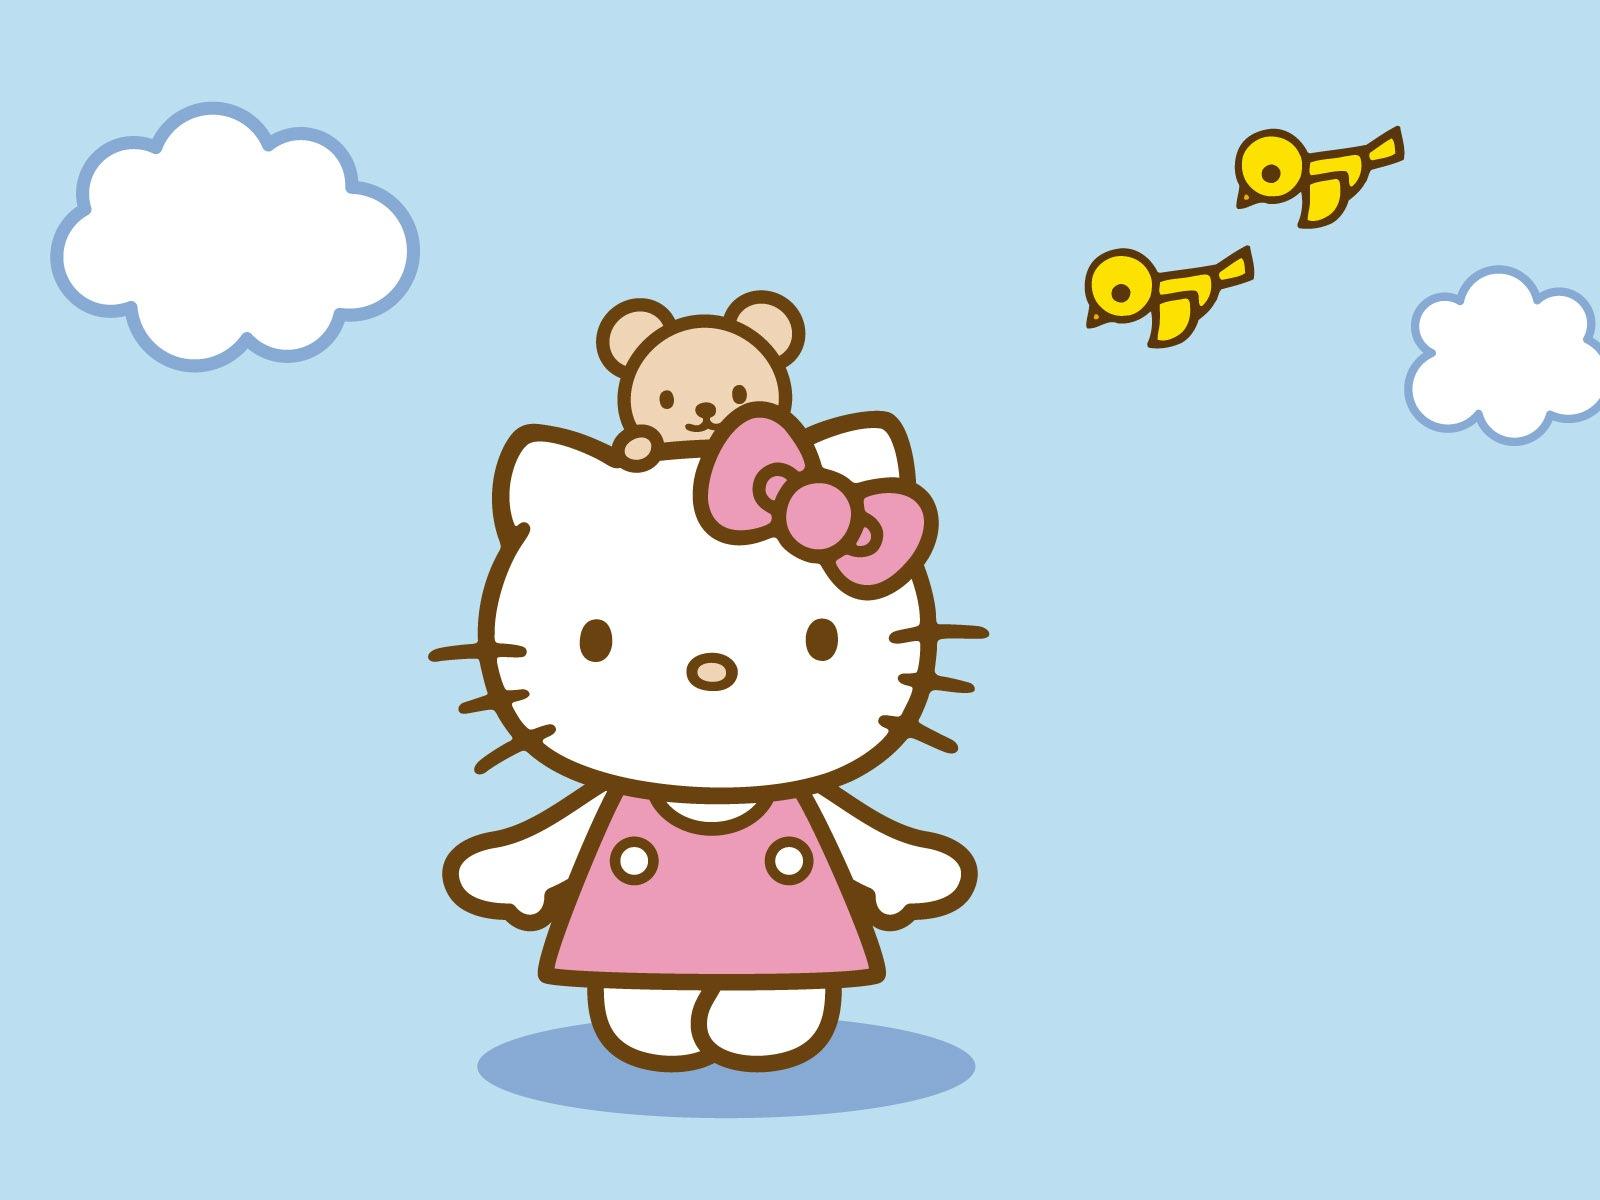 Good Wallpaper Hello Kitty Android - 5243415651_ec32bd84c2_o  Graphic_218170.jpg